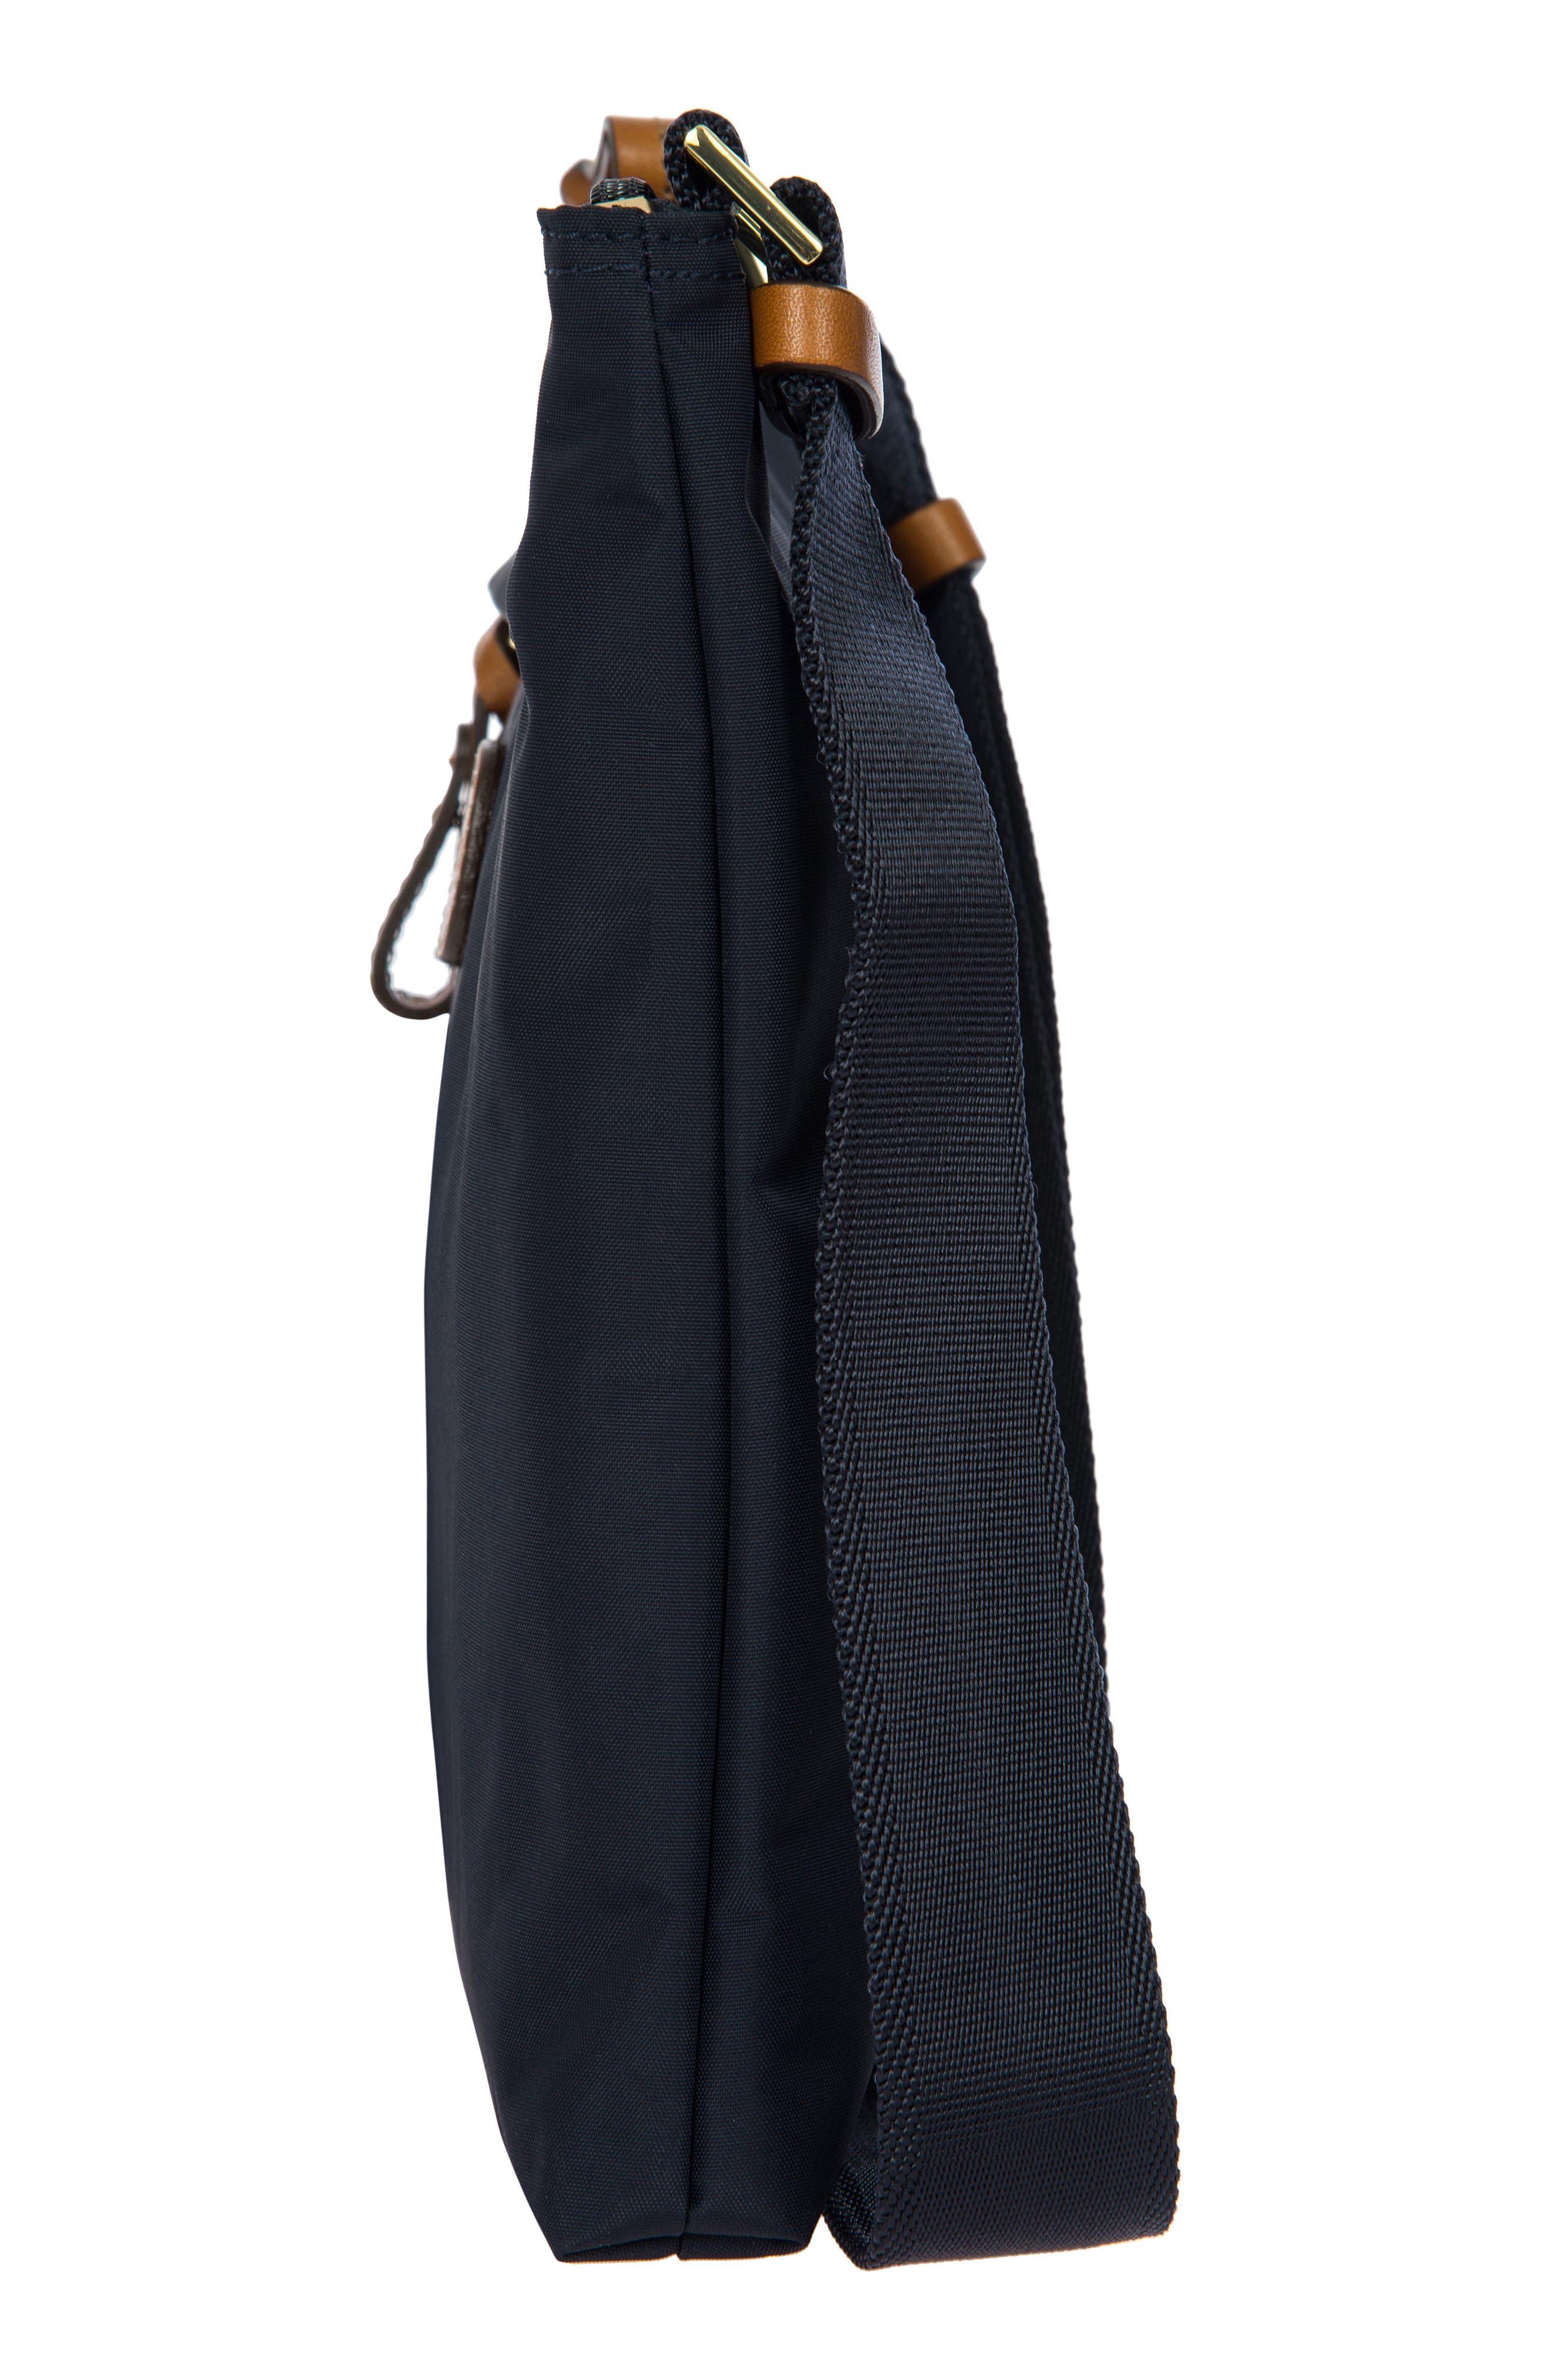 X-Bag Urban Crossbody Bag,                             Alternate thumbnail 4, color,                             Navy